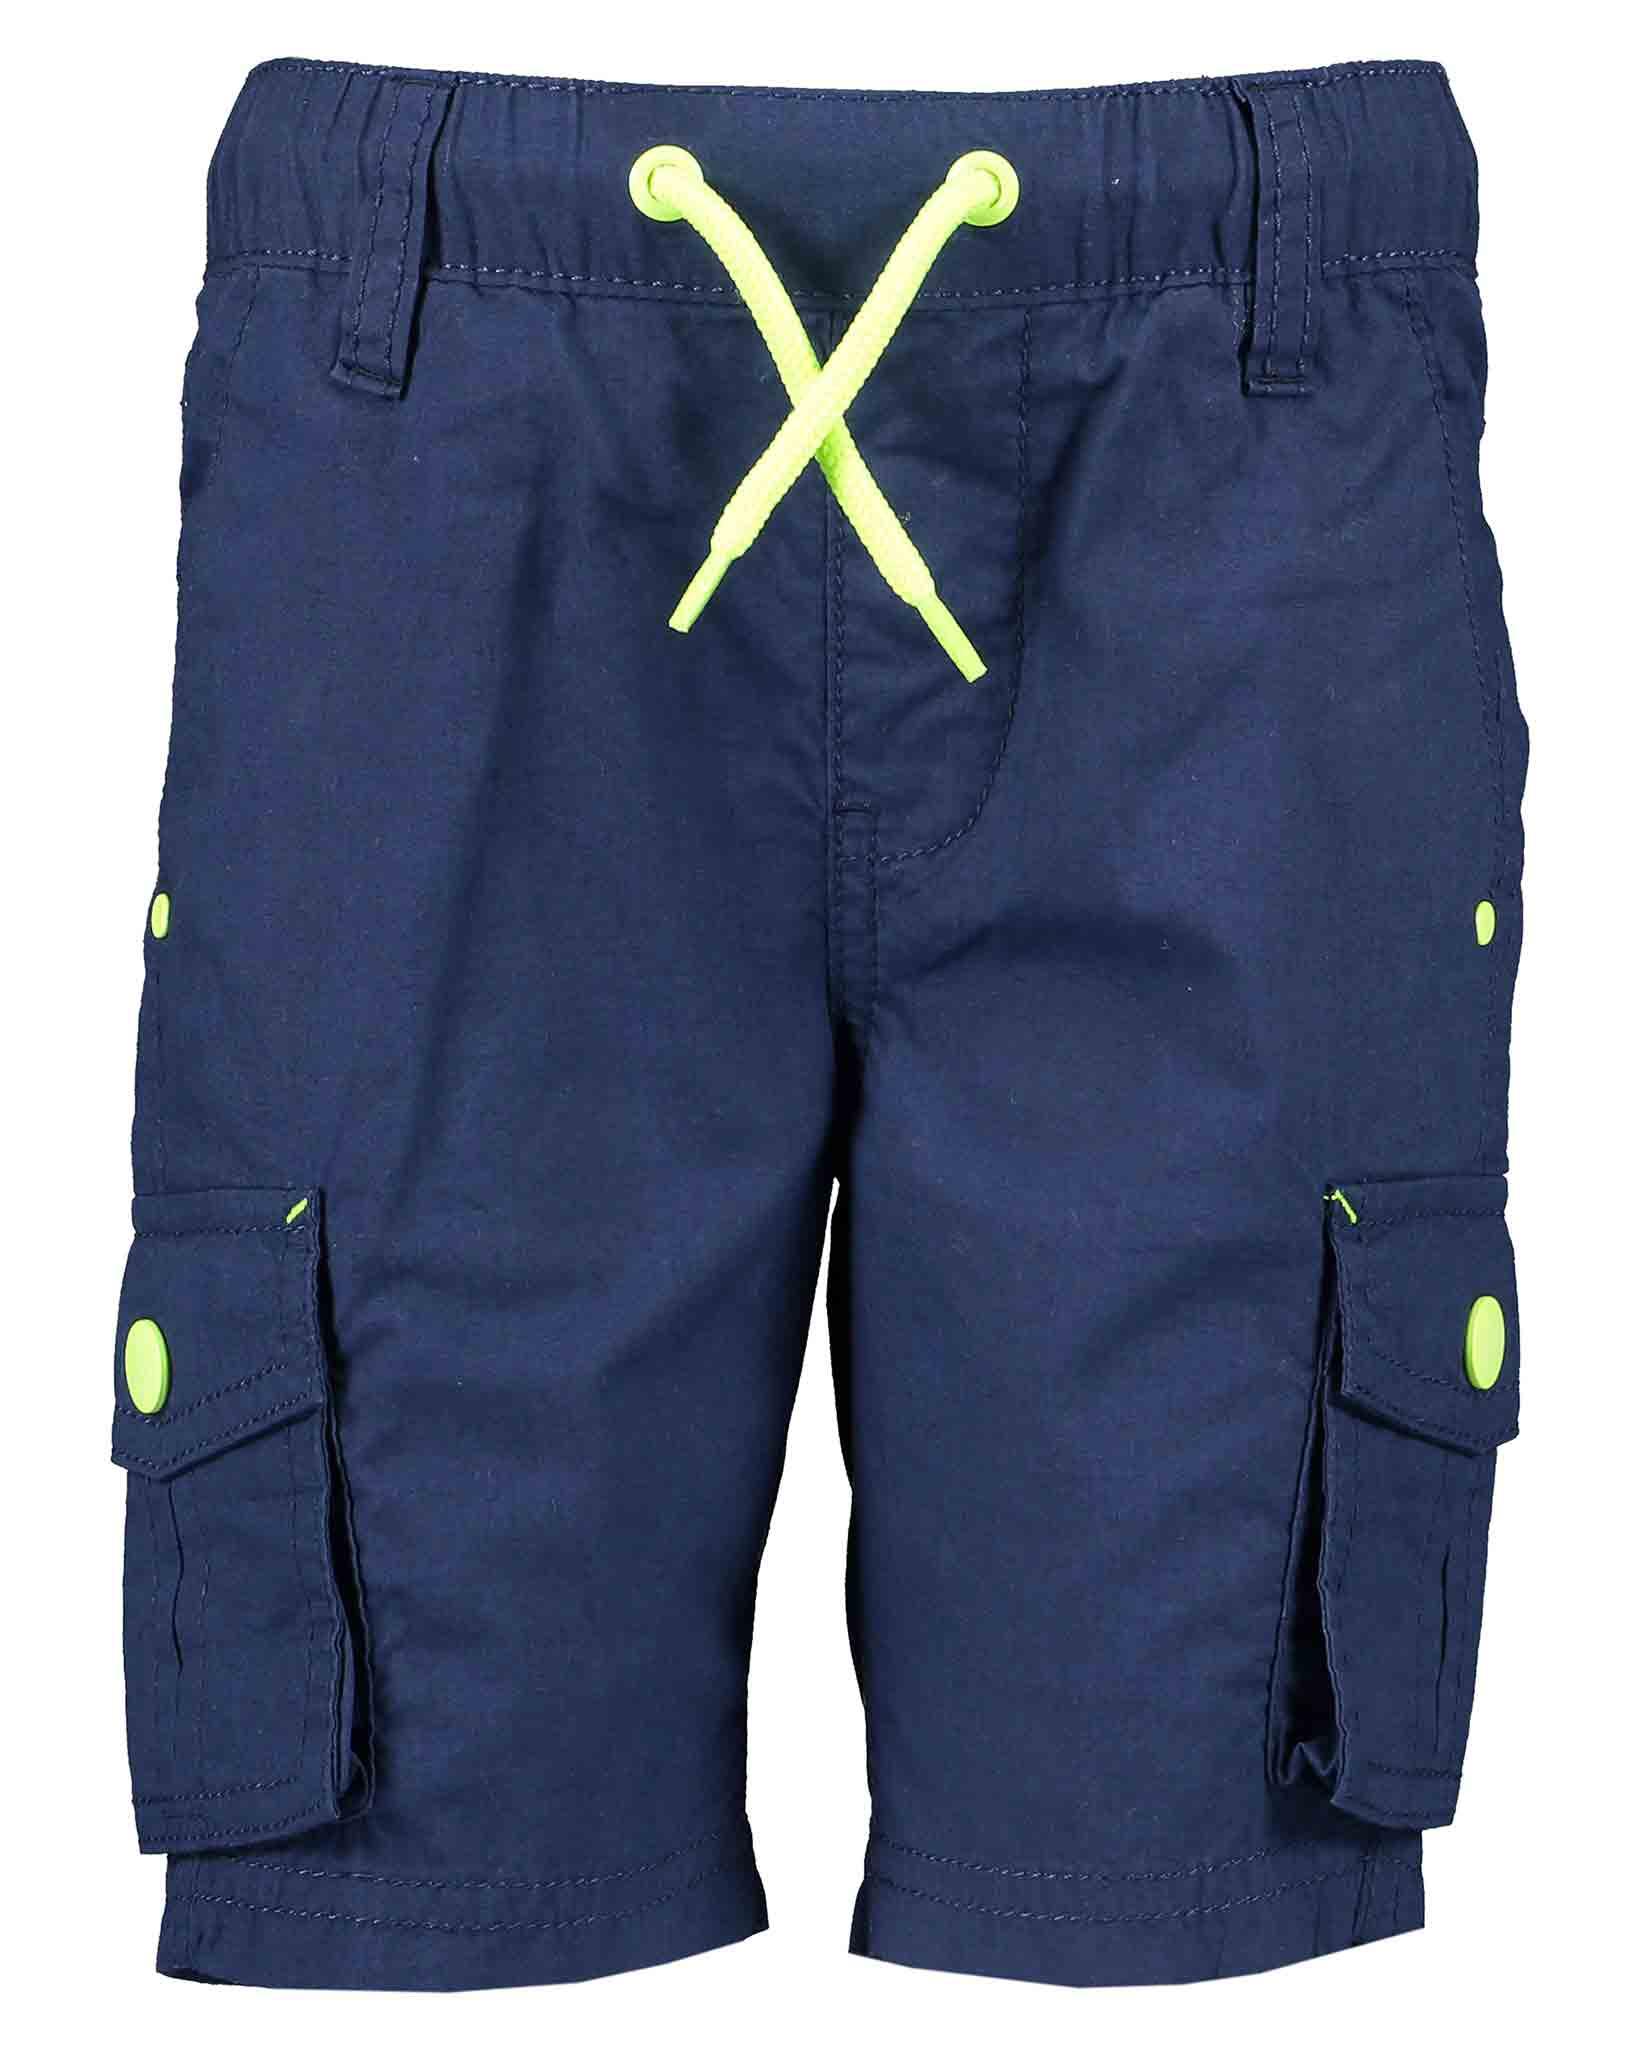 Shorts 092 dunkelblau Blue Seven